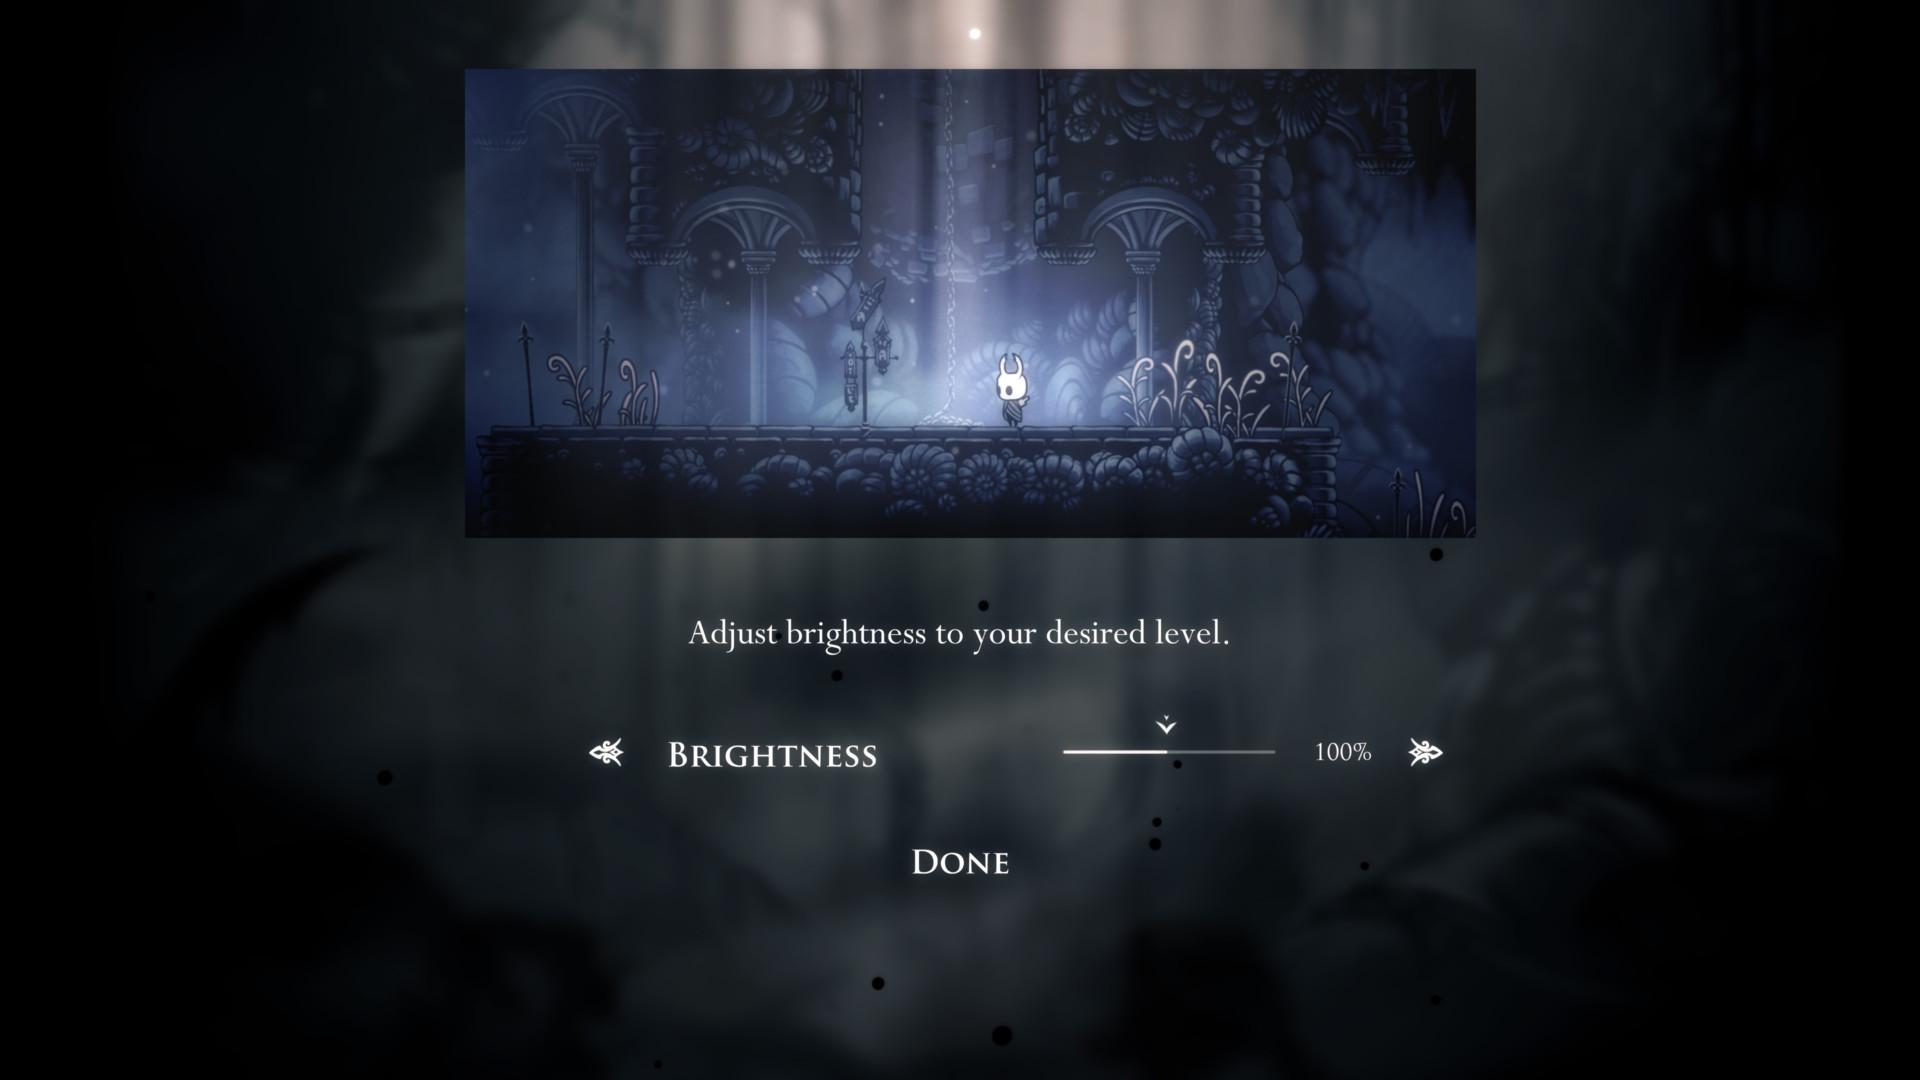 Brightness screenshot of Hollow Knight video game interface.